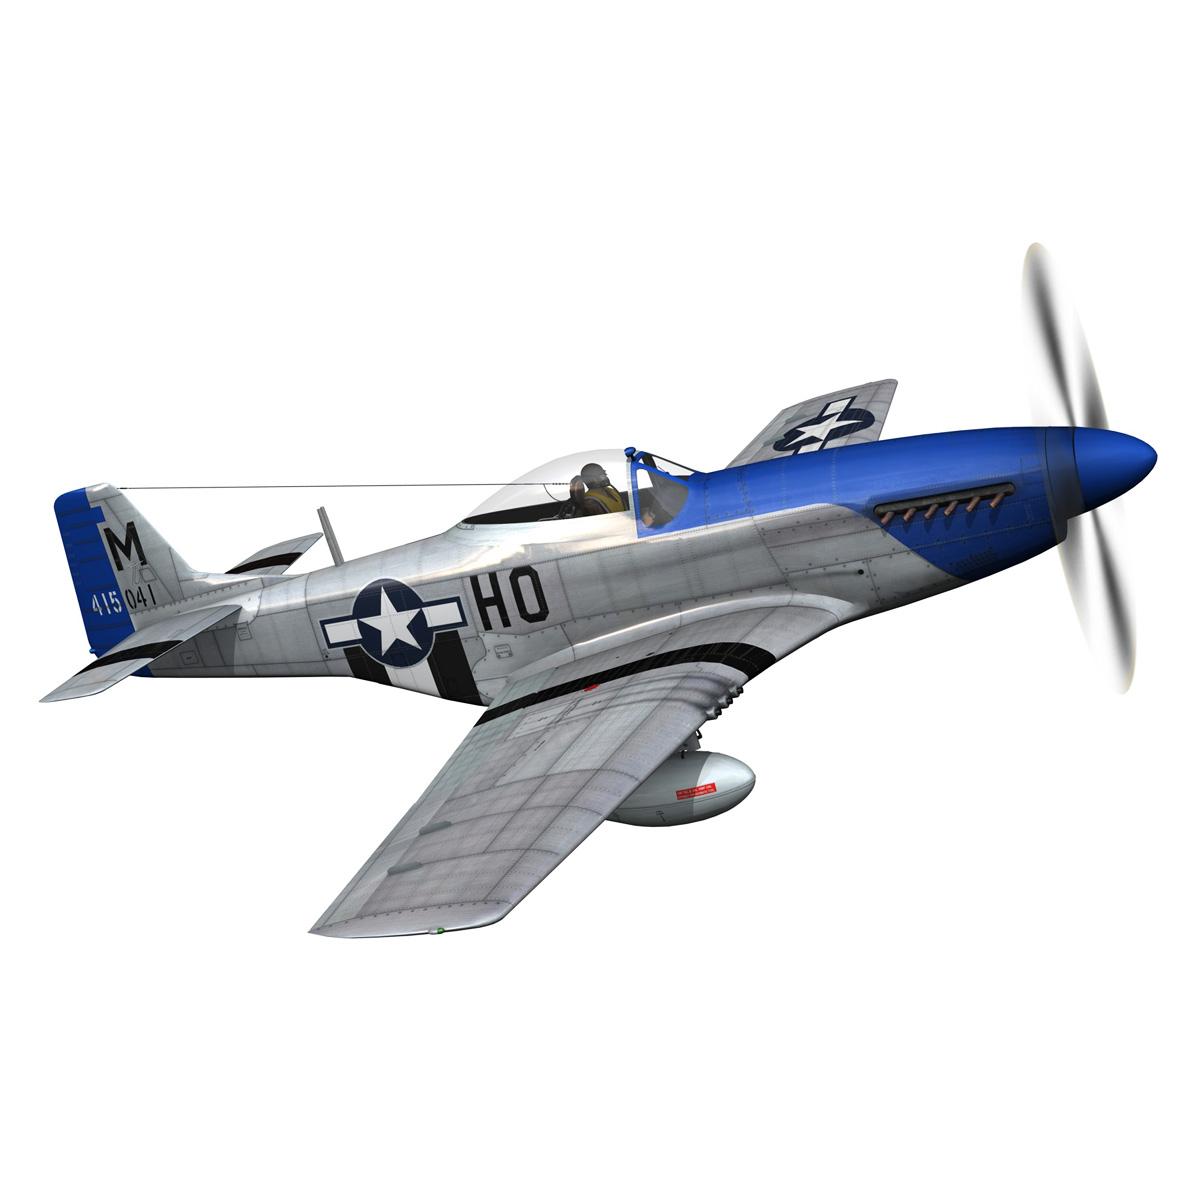 north american p-51d mustang – petie 3rd 3d model fbx c4d lwo obj 280133